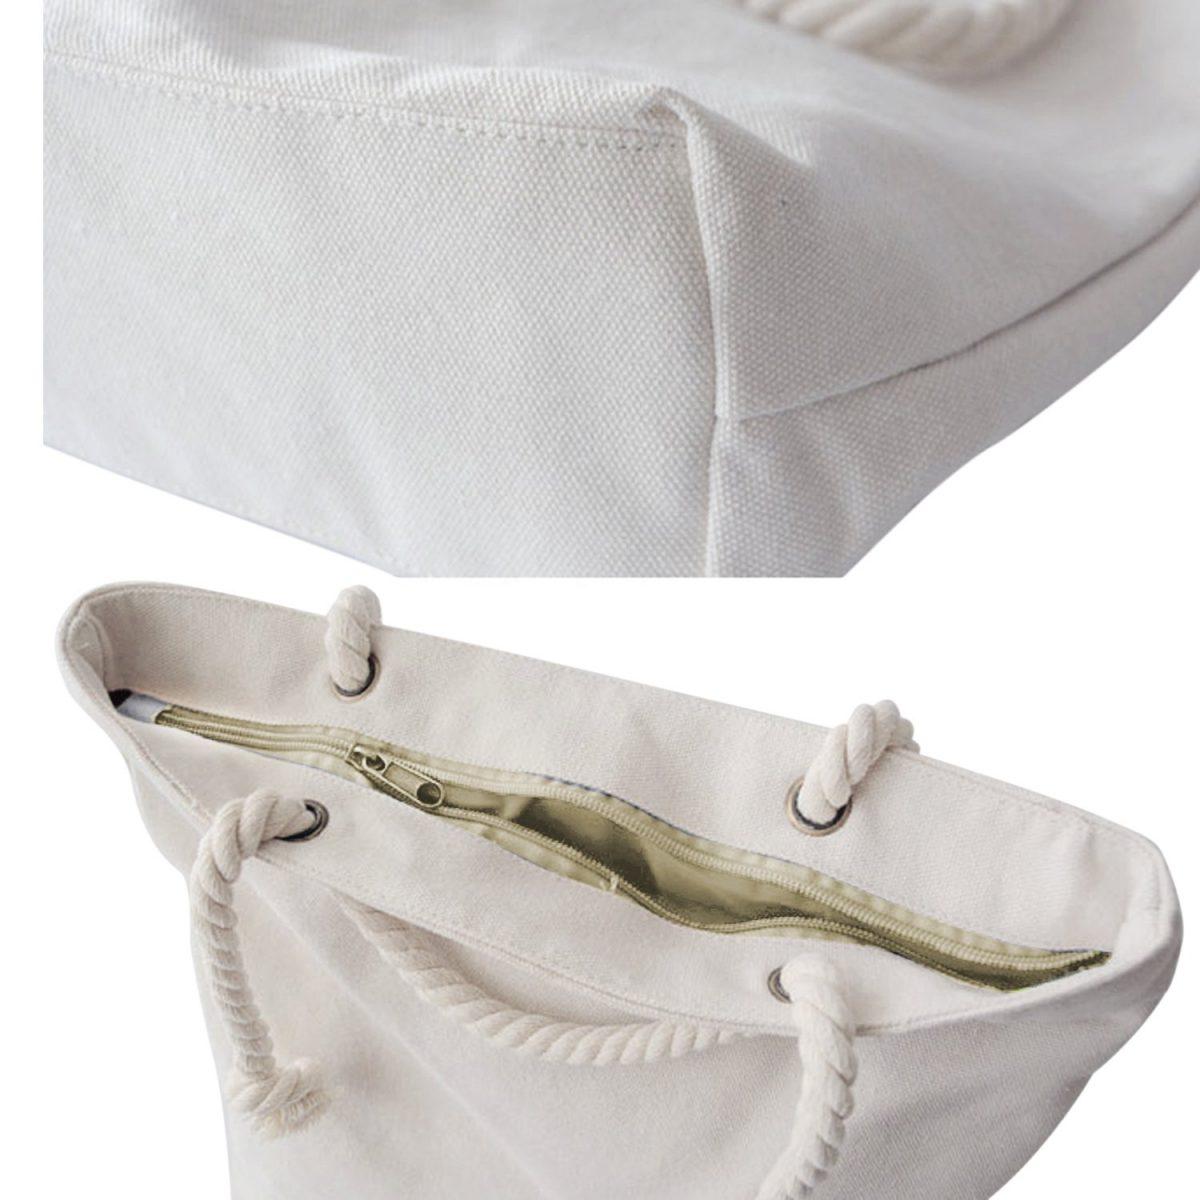 Piero Fornasetti Tasarımlı Fermuarlı Modern Kumaş Çanta Realhomes